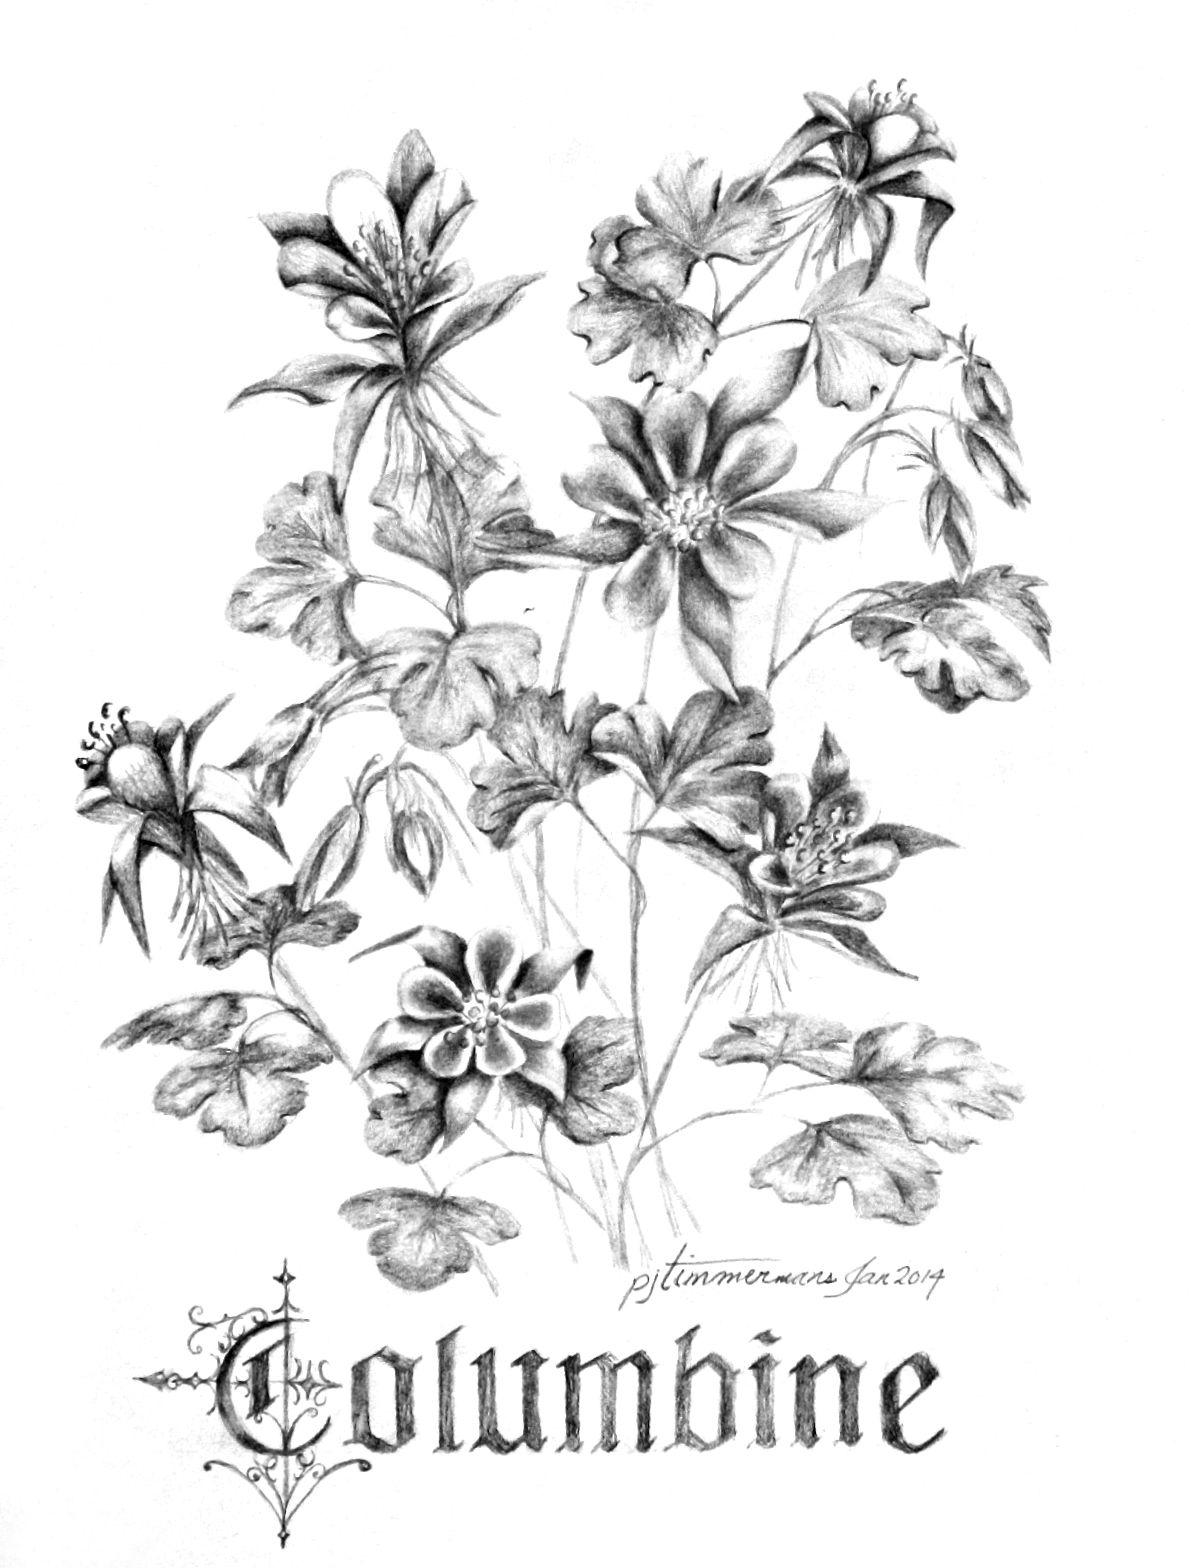 Columbine flowers luv2draw ink pinterest tattoo and tatting columbine flowers luv2draw izmirmasajfo